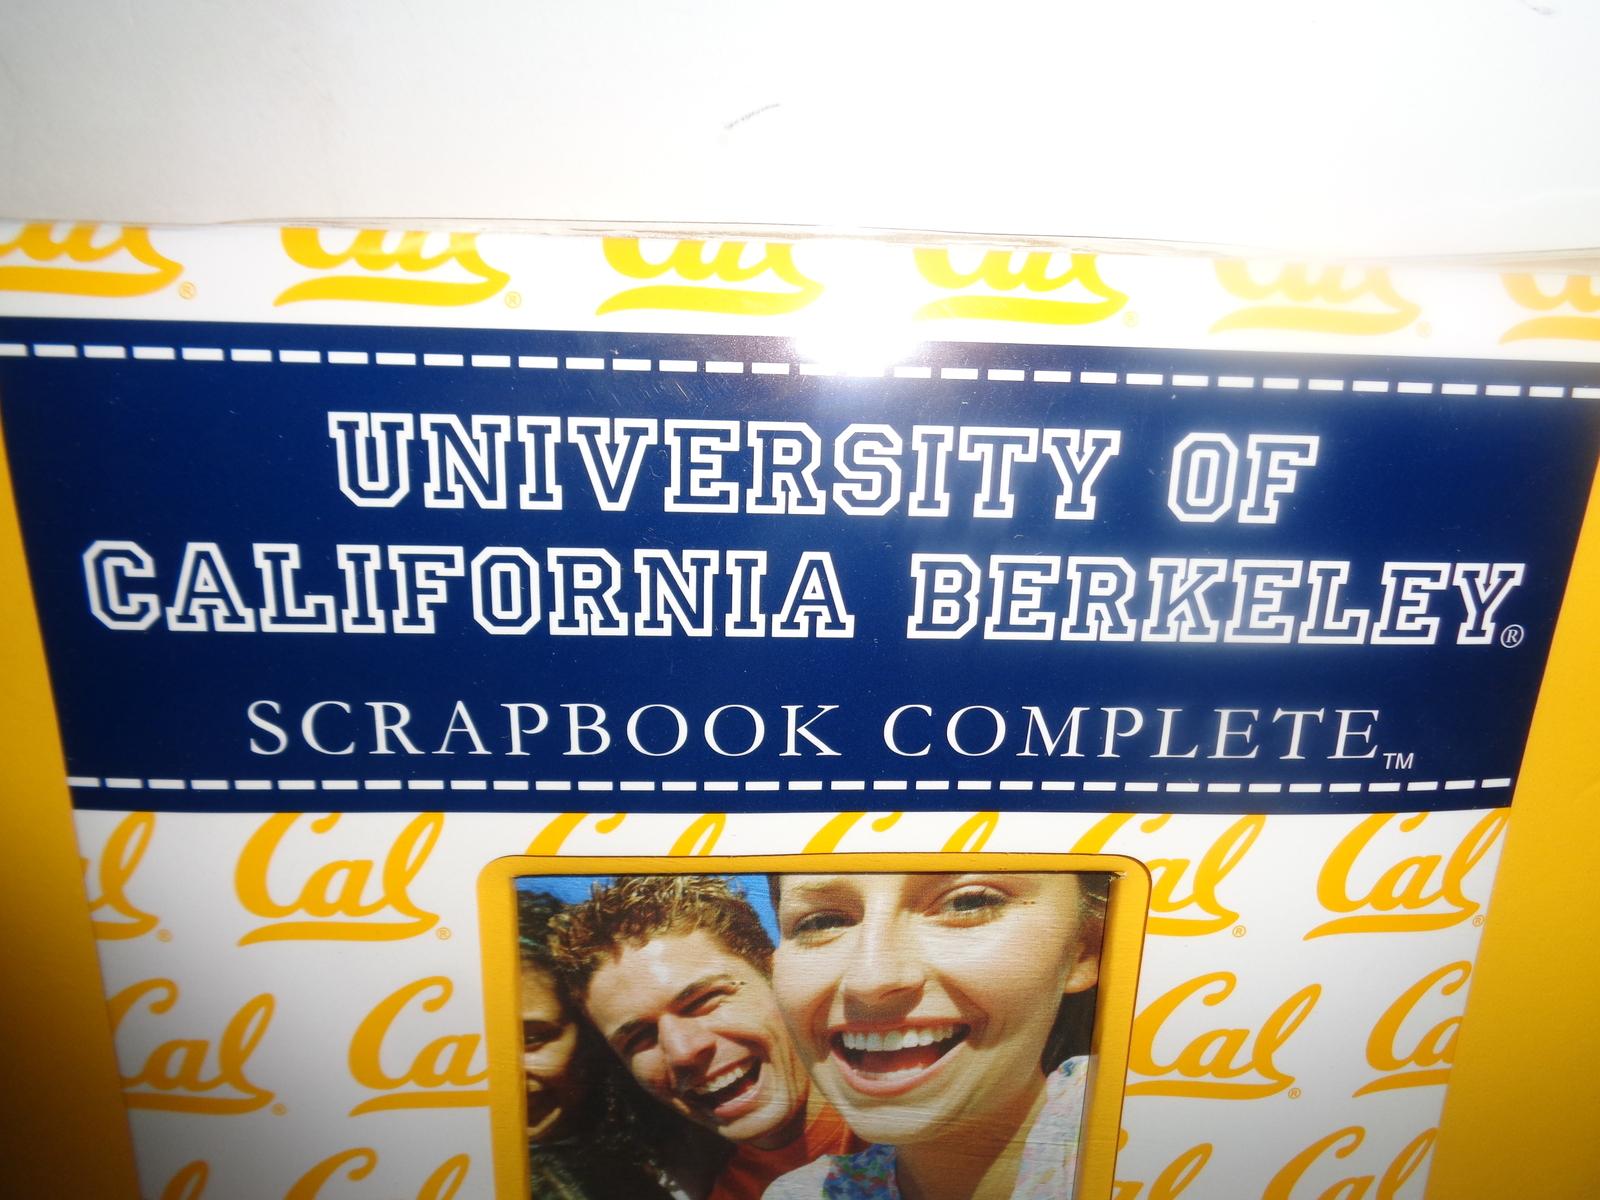 University Of California Berkeley Complete Scrapbook NWT Fast Easy Collegiate